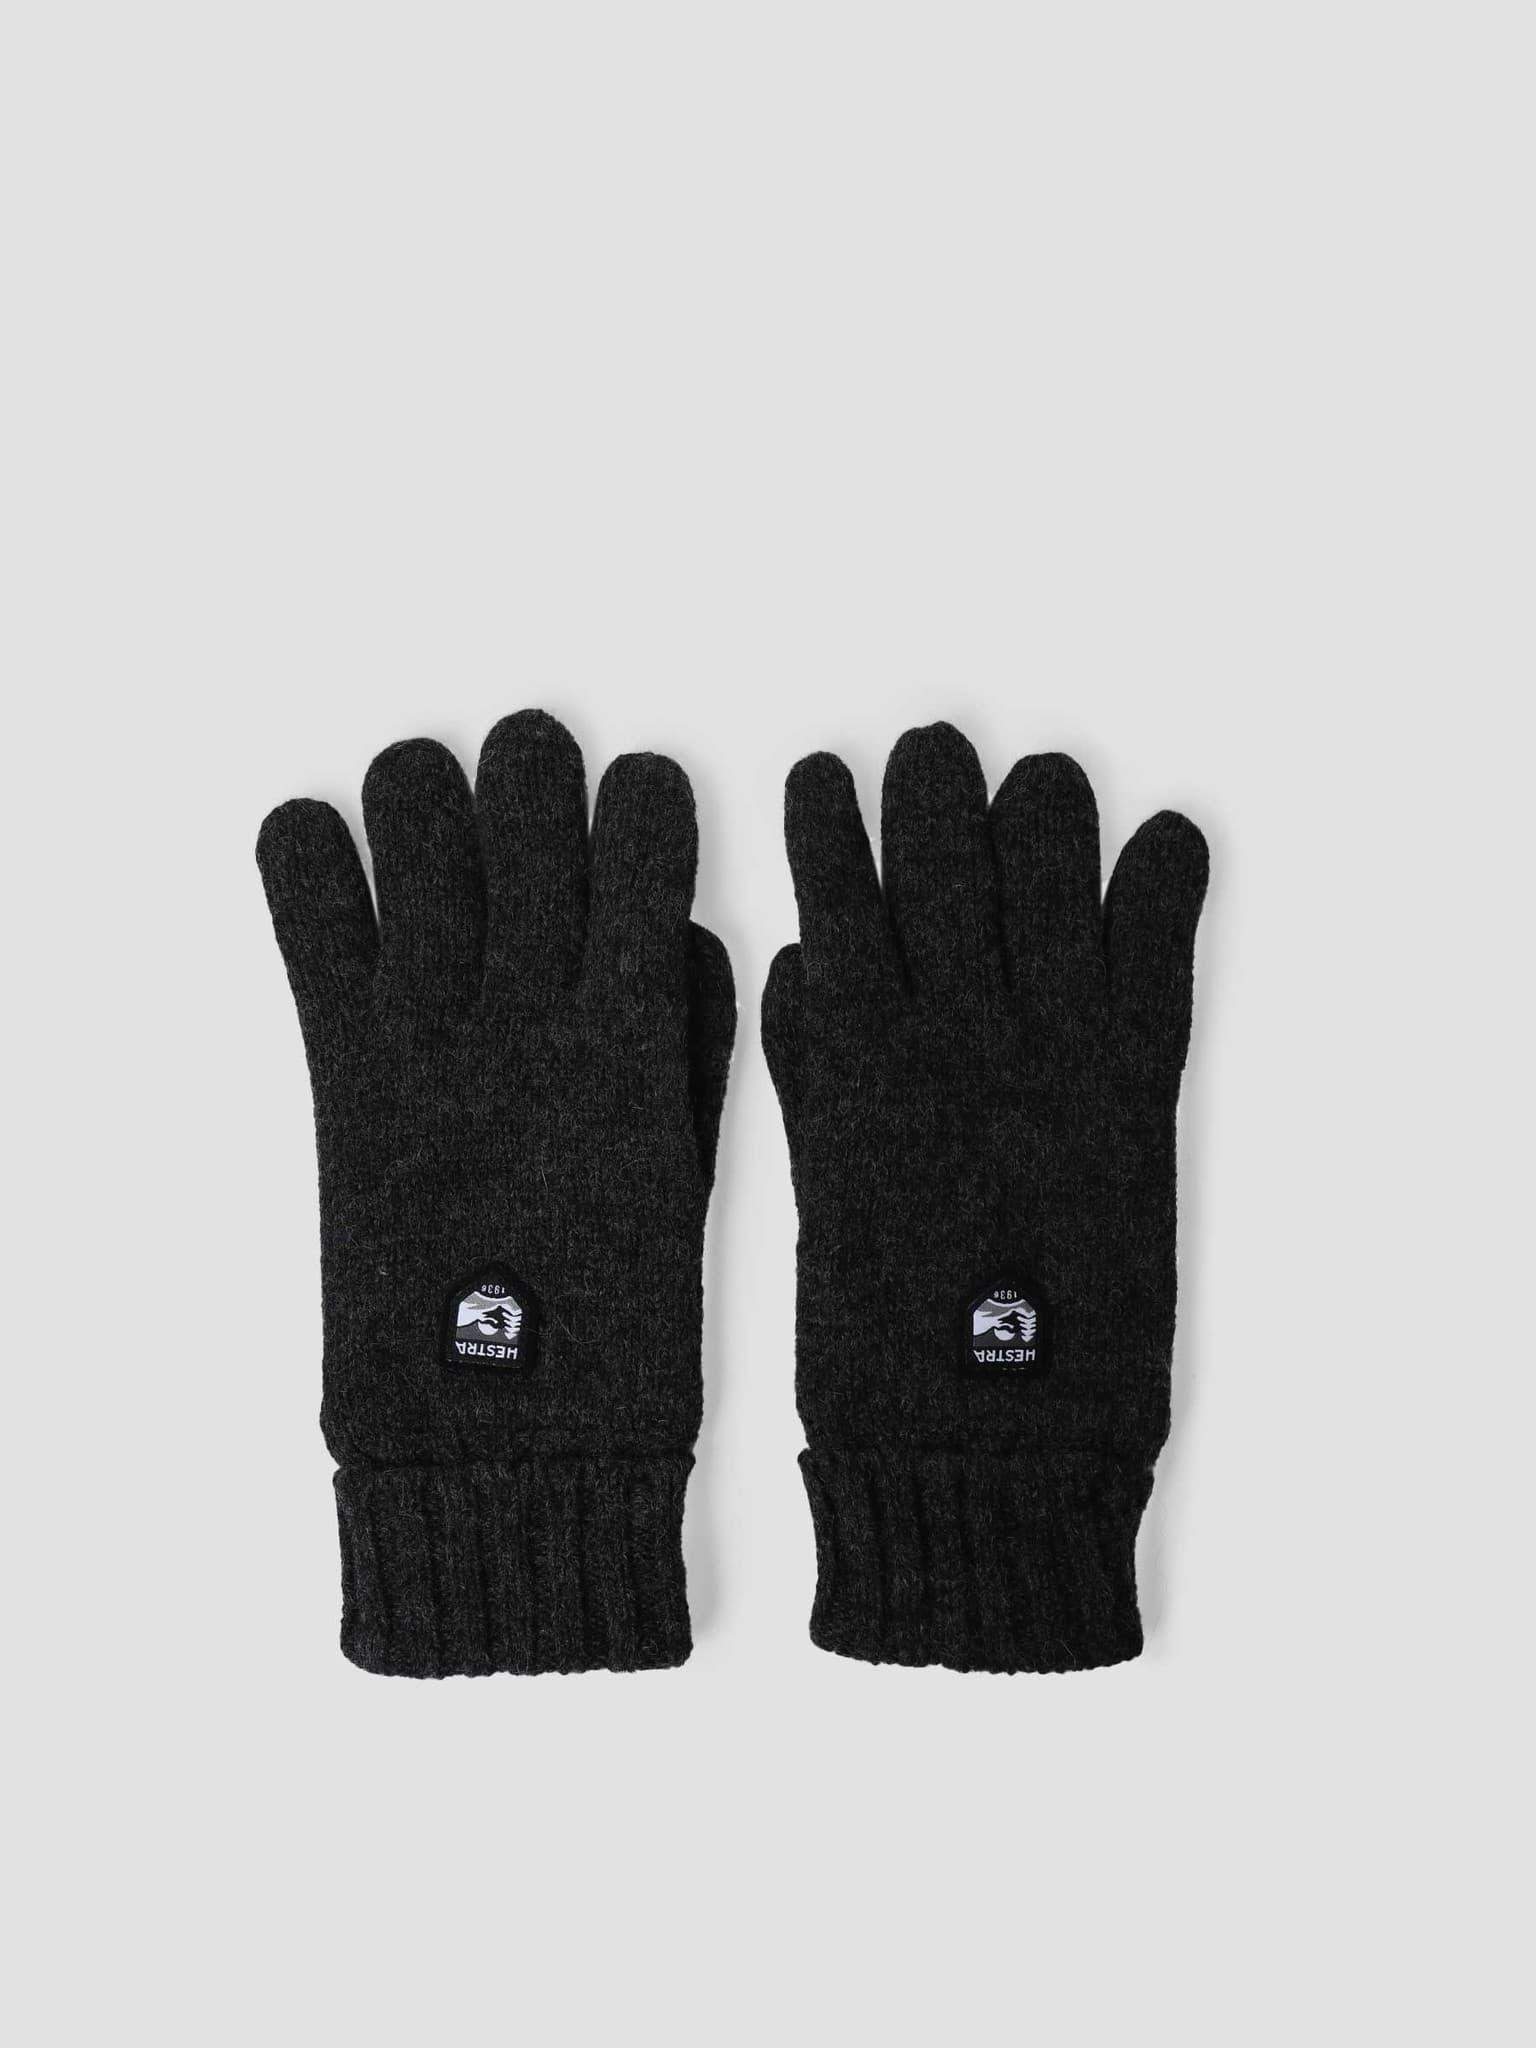 Basic Wool Glove Charocoal 63660-390